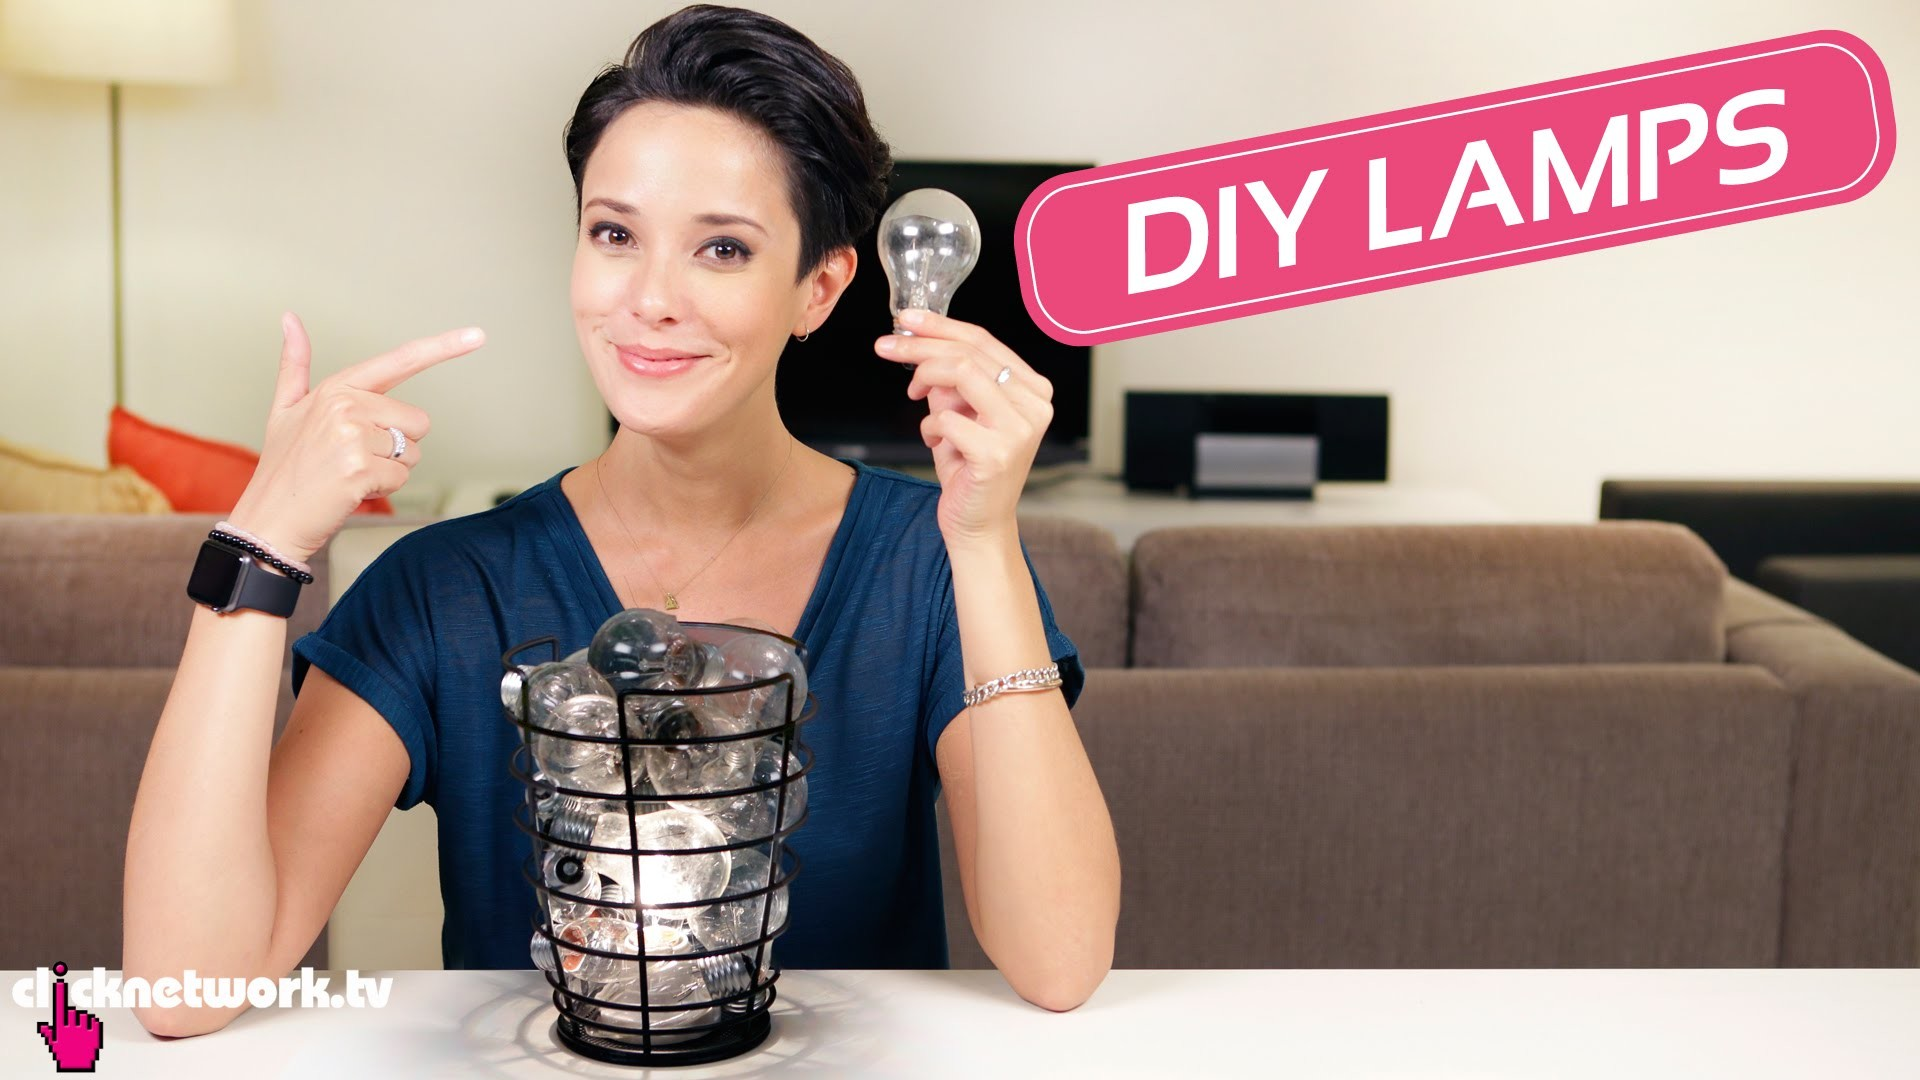 DIY Lamps - Hack It: EP16